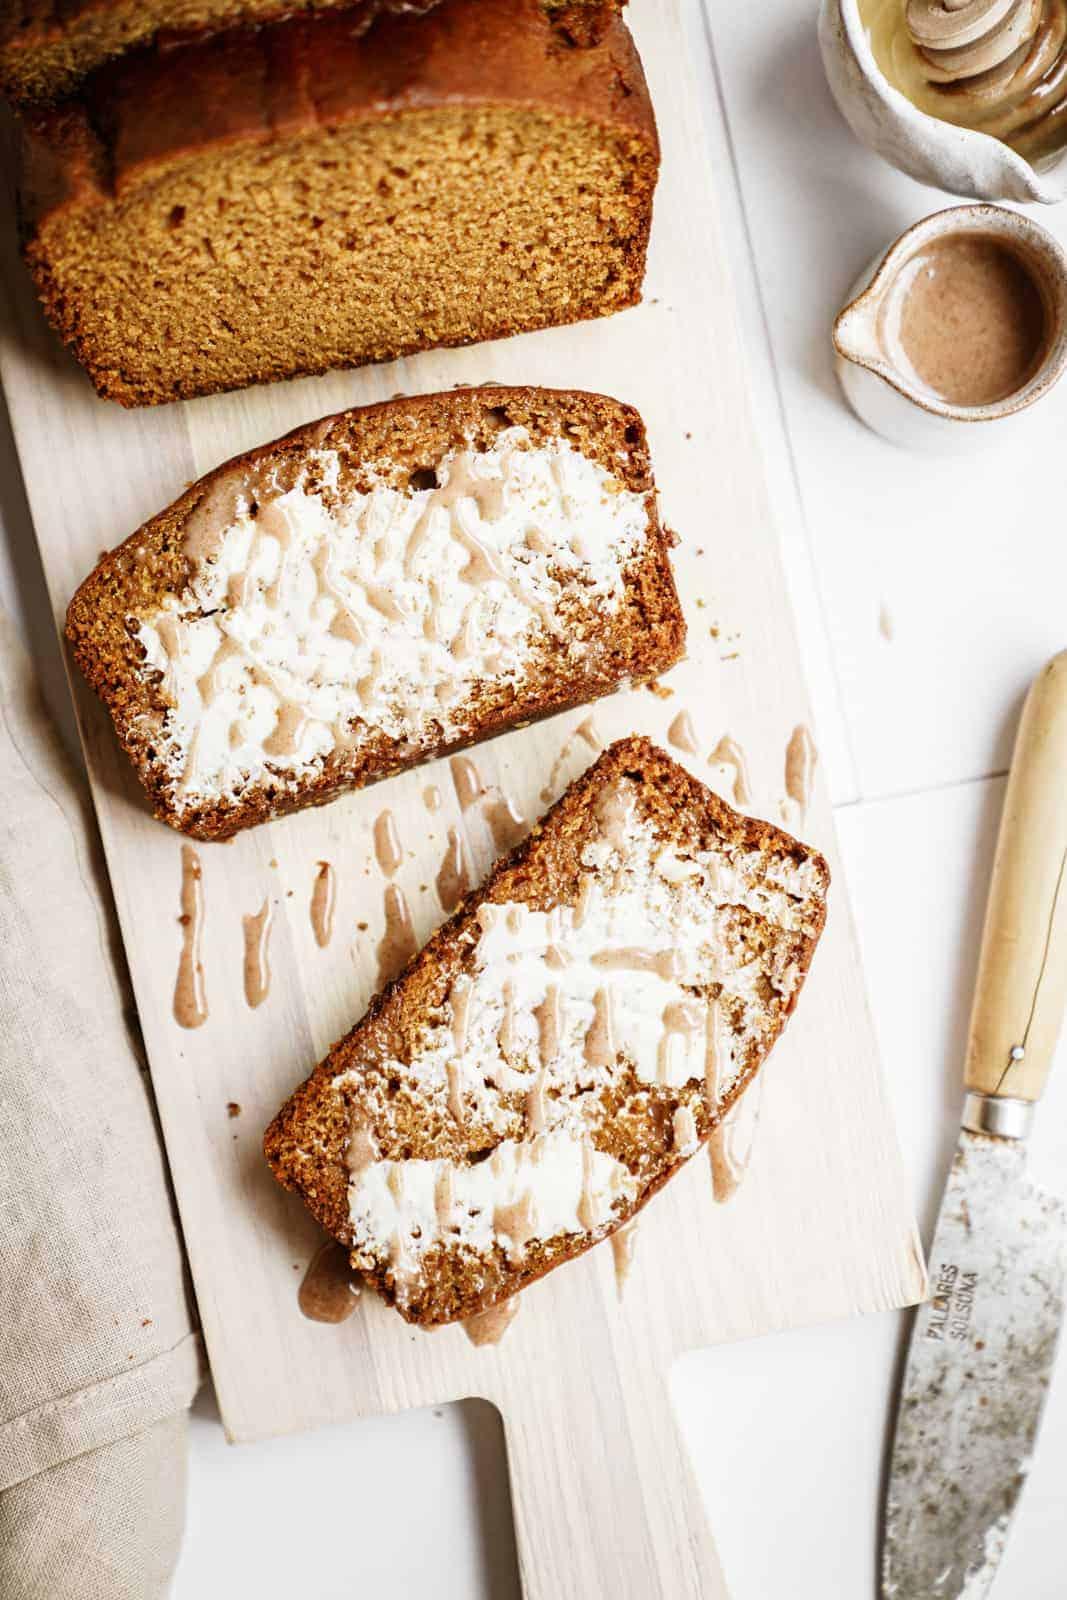 Sliced vegan pumpkin bread on cutting board